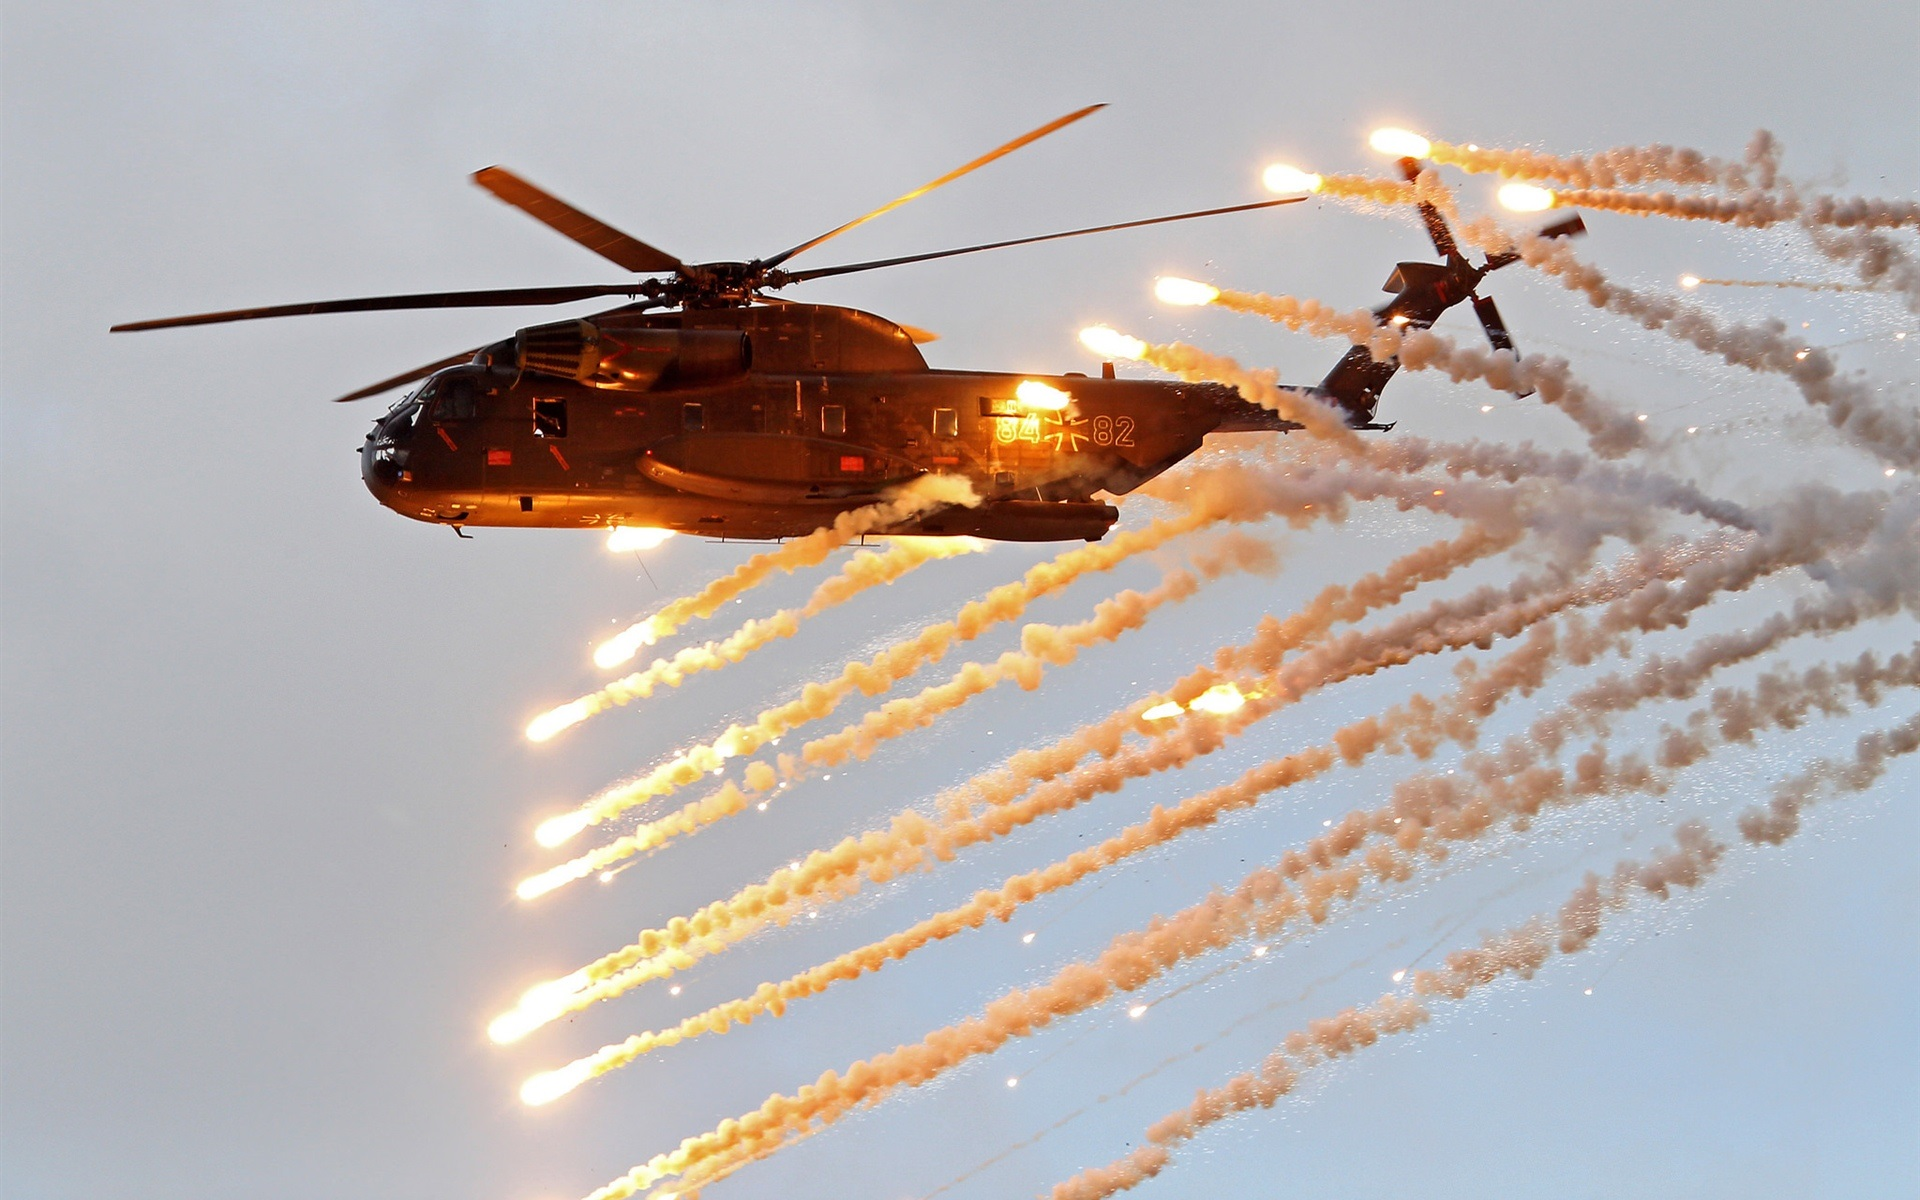 Fondos De Pantalla Sikorsky Ch 53 Sea Stallion Helicóptero